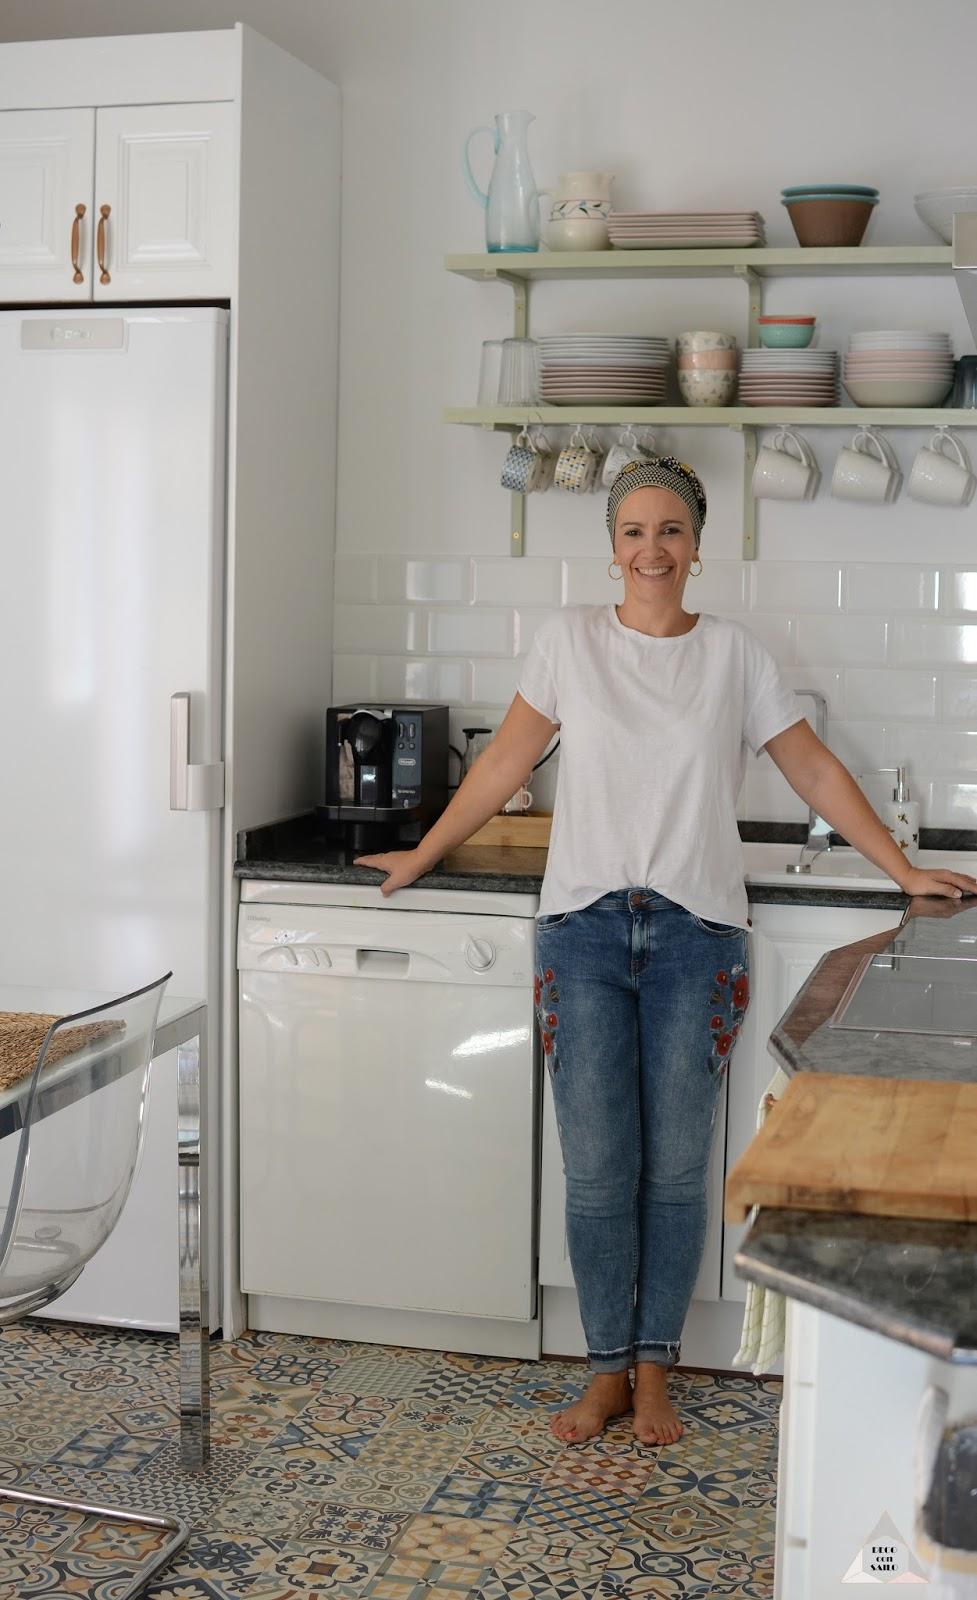 renovación cocina pintar muebles en blanco